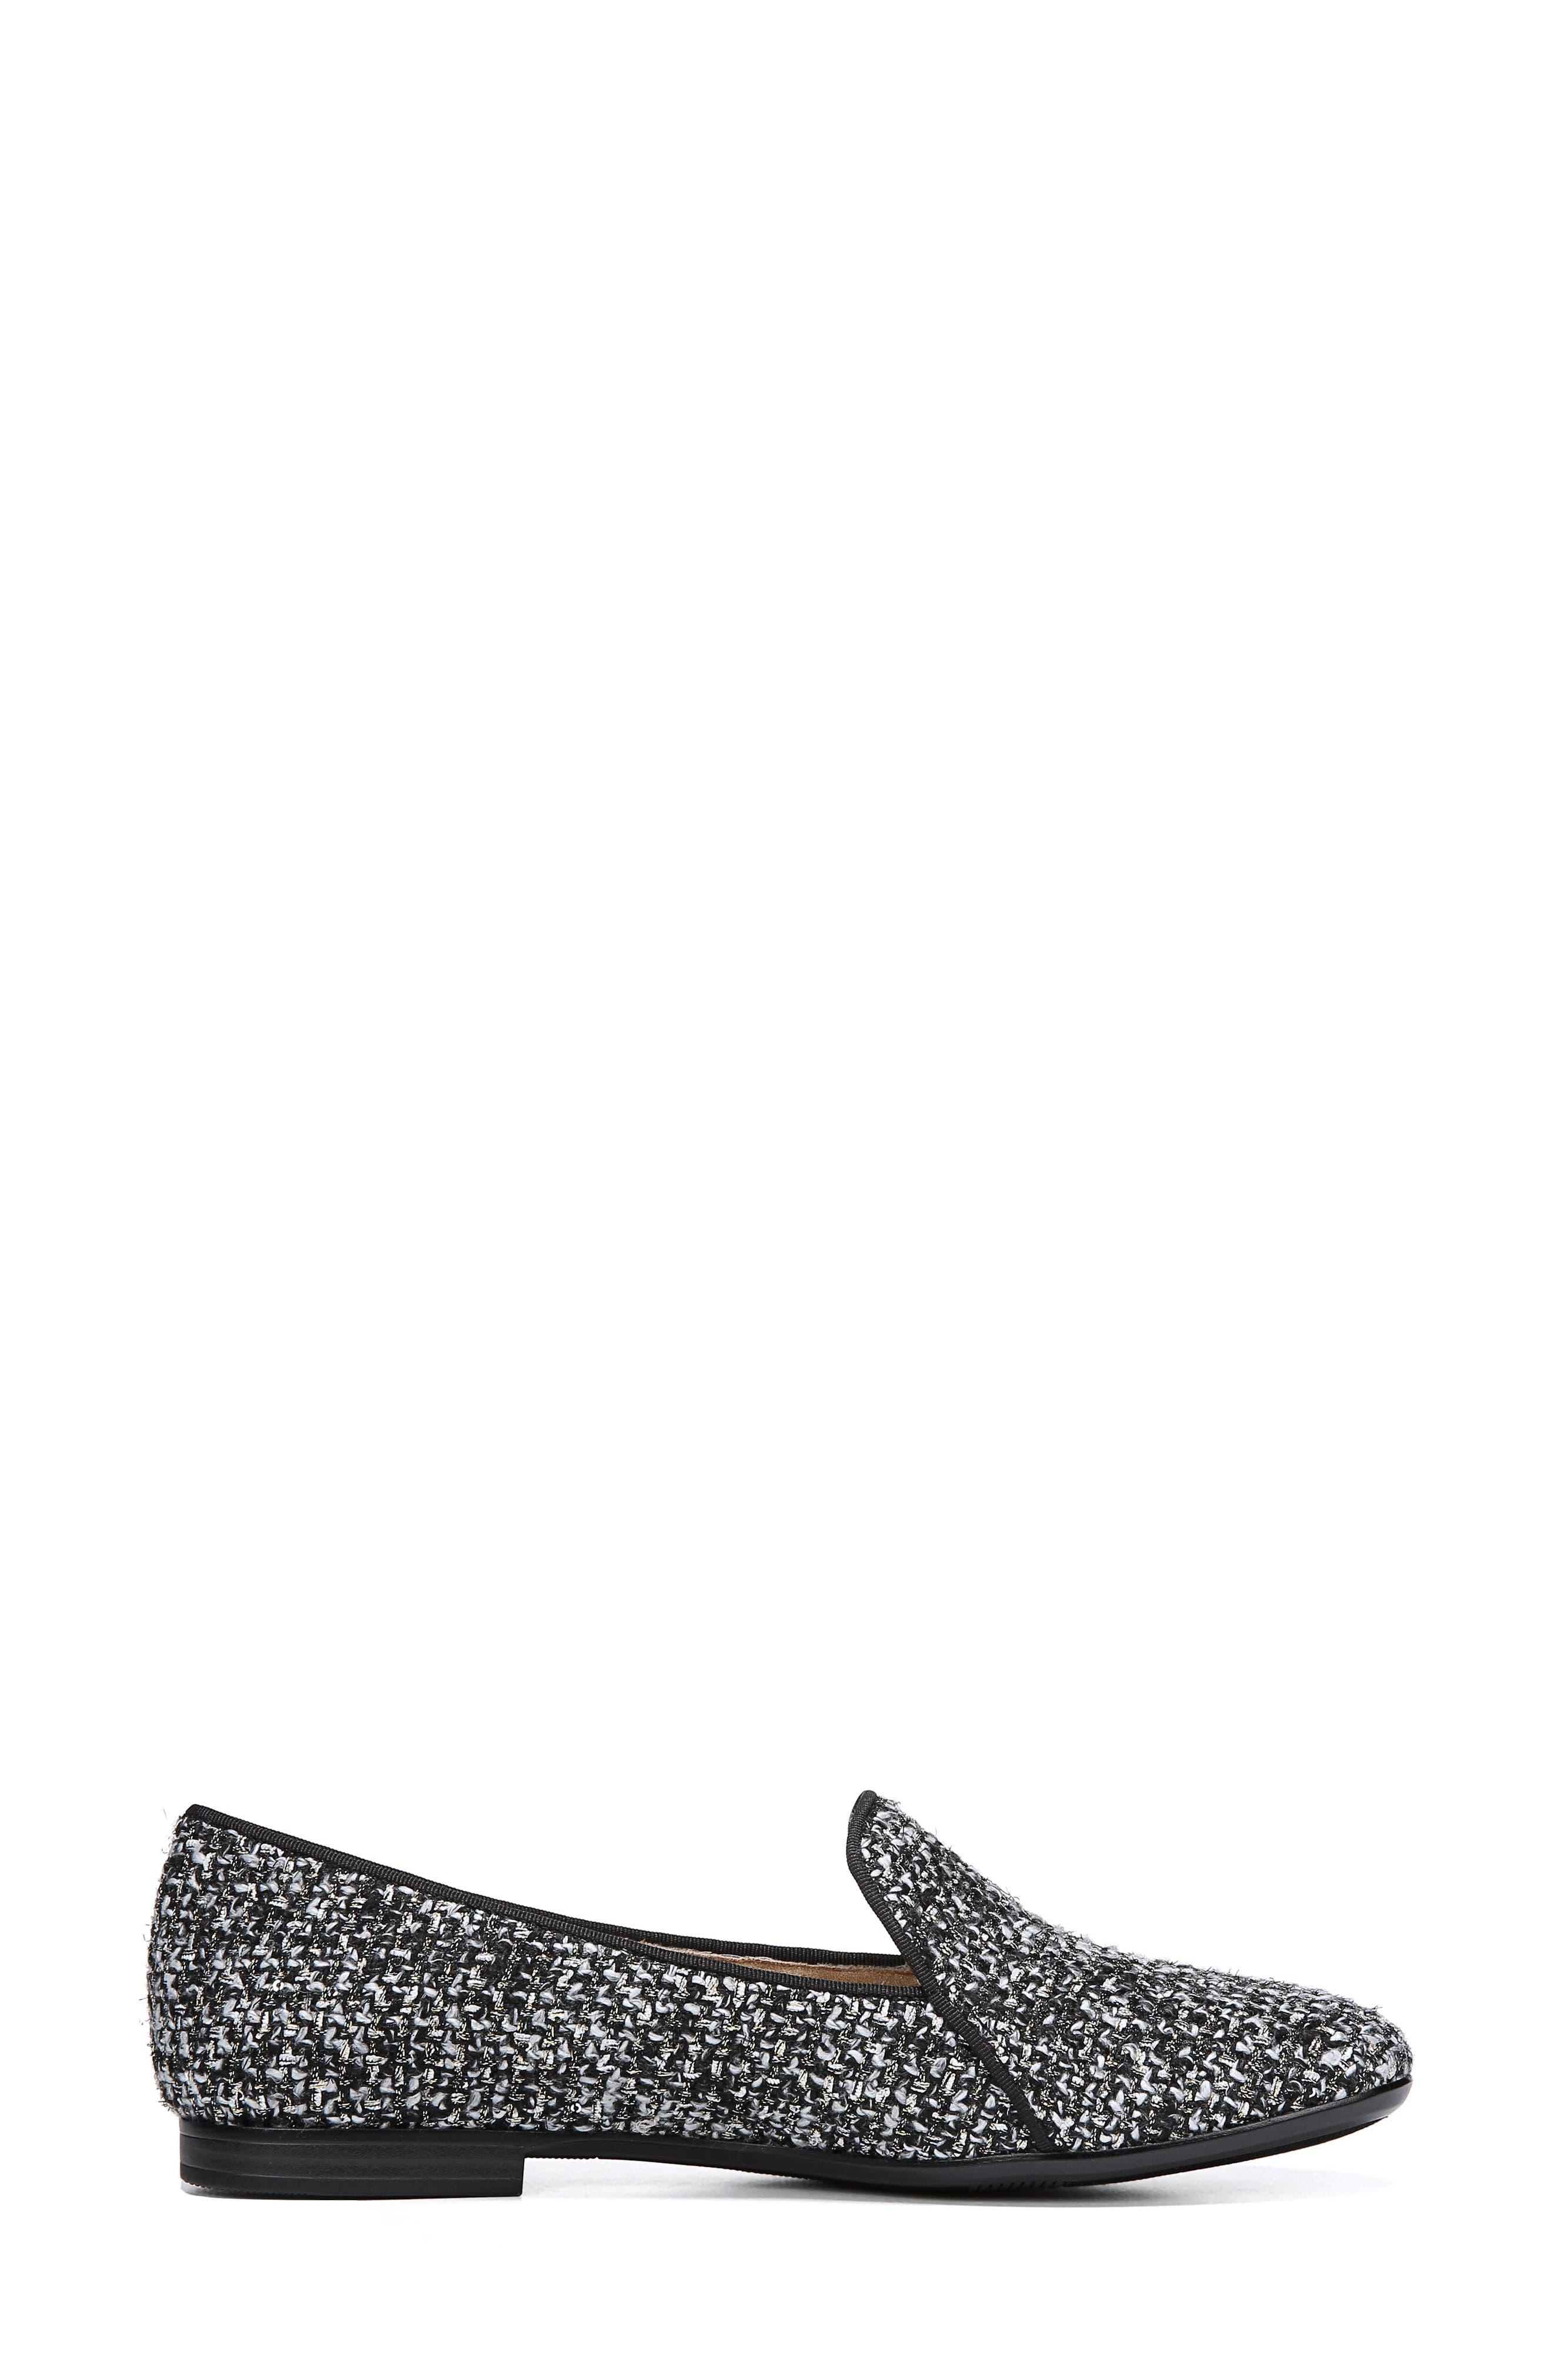 Emiline 2 Loafer,                             Alternate thumbnail 3, color,                             BLACK/ WHITE TWEED FABRIC